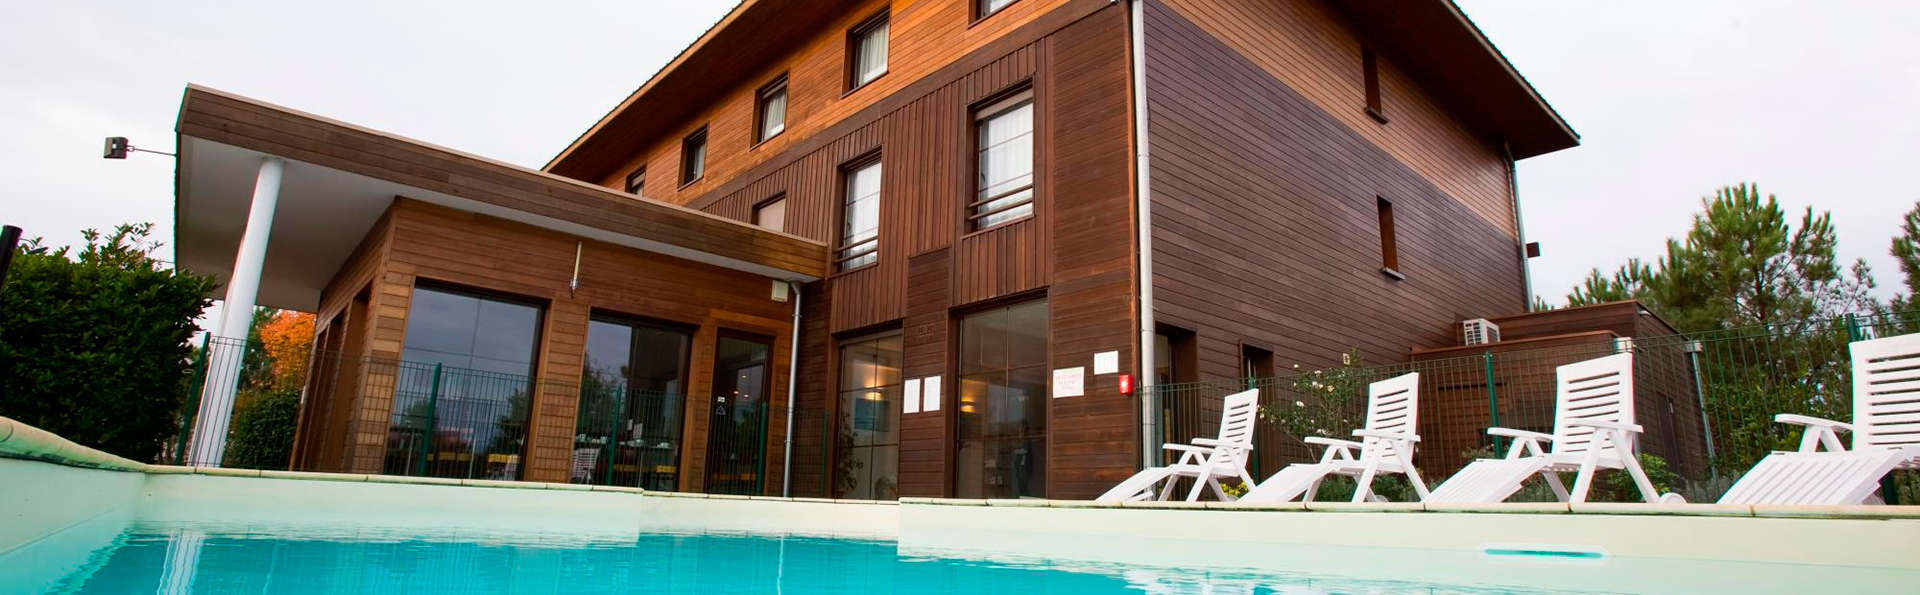 Hôtel All Suites Le Teich - EDIT_pool2.jpg